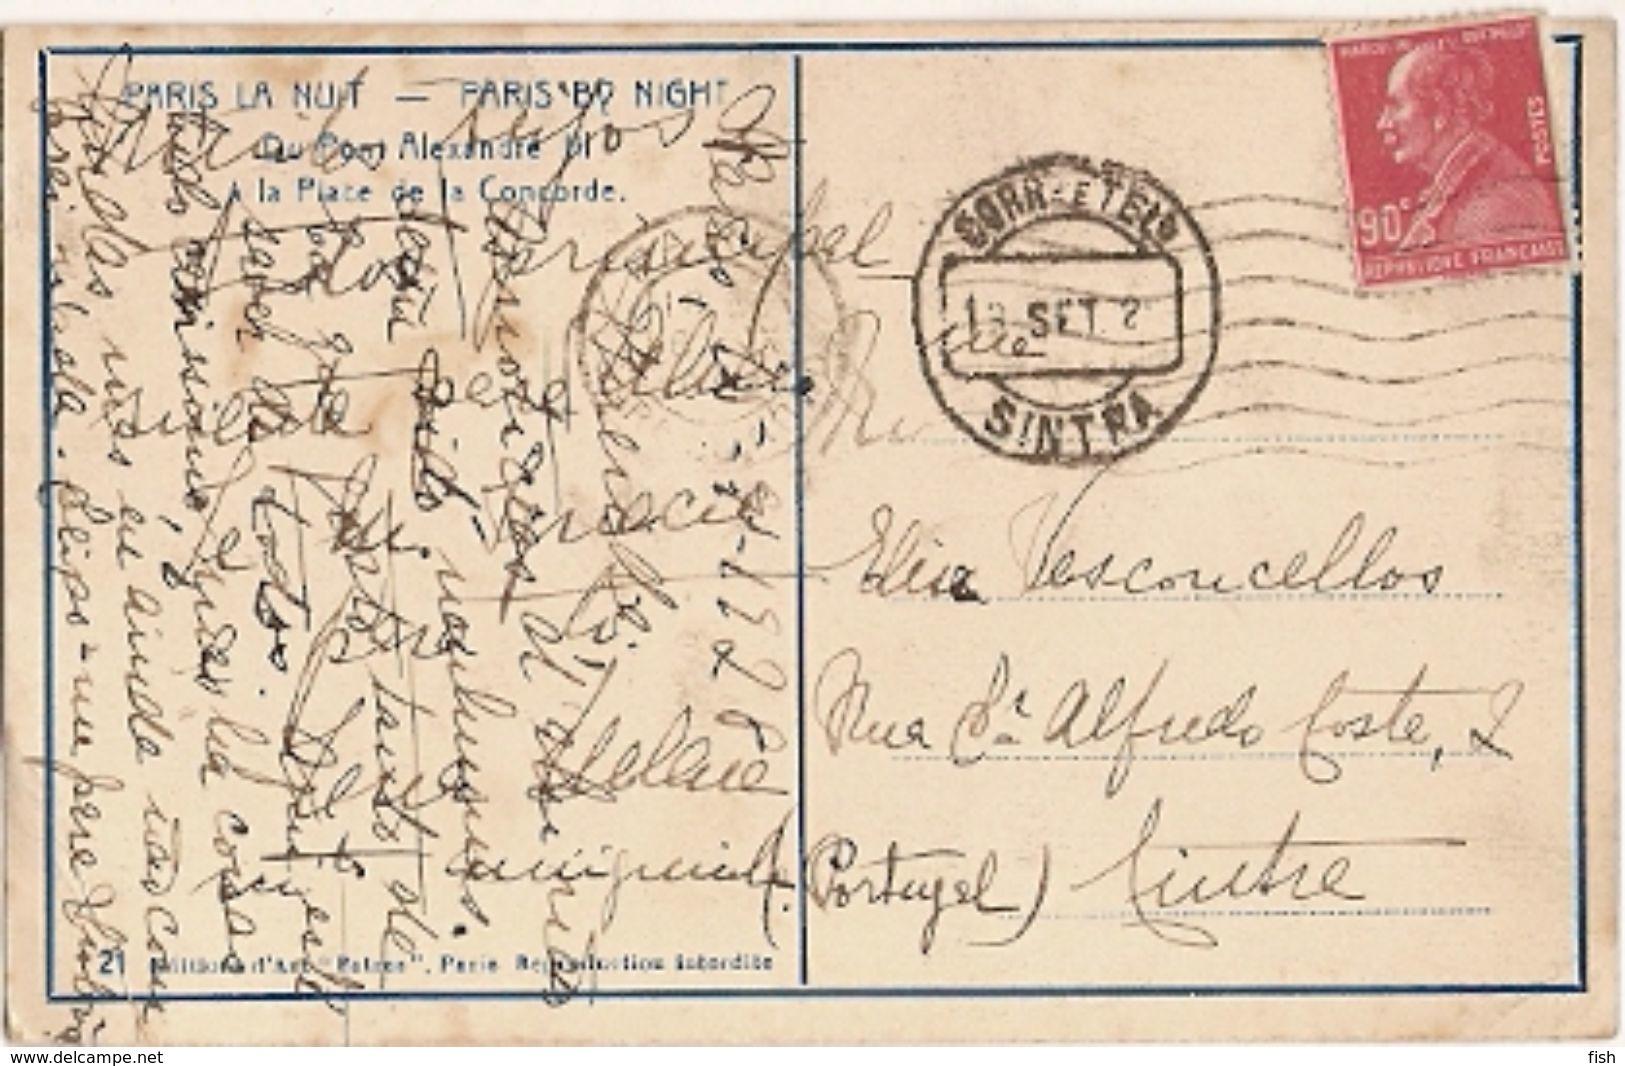 France & Circulated, Paris,  La Nuit, Sintra Portugal 1928 (32) - Monuments